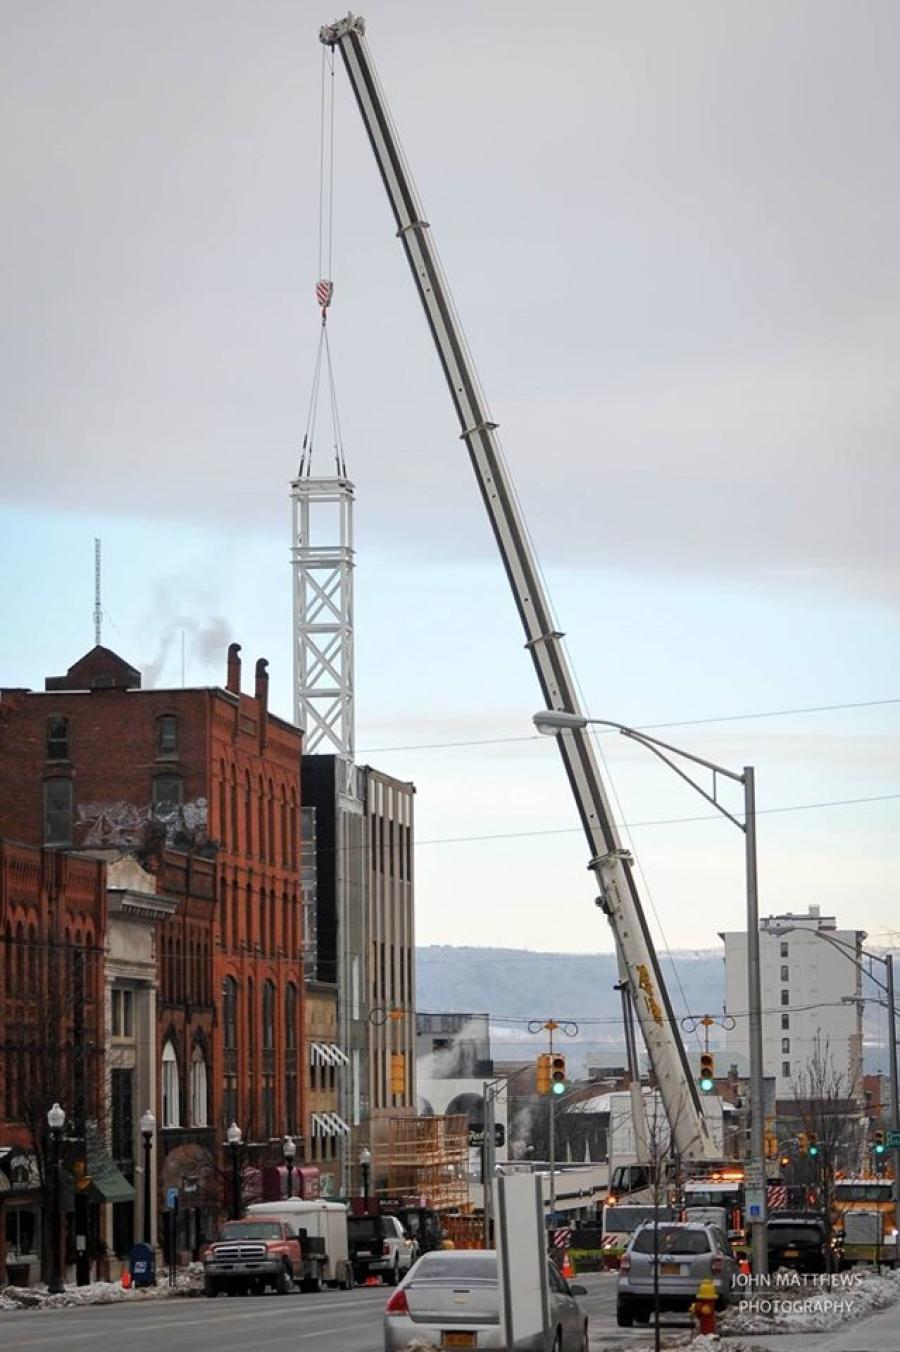 The Utica Bank clock tower.John Matthews Photography photo